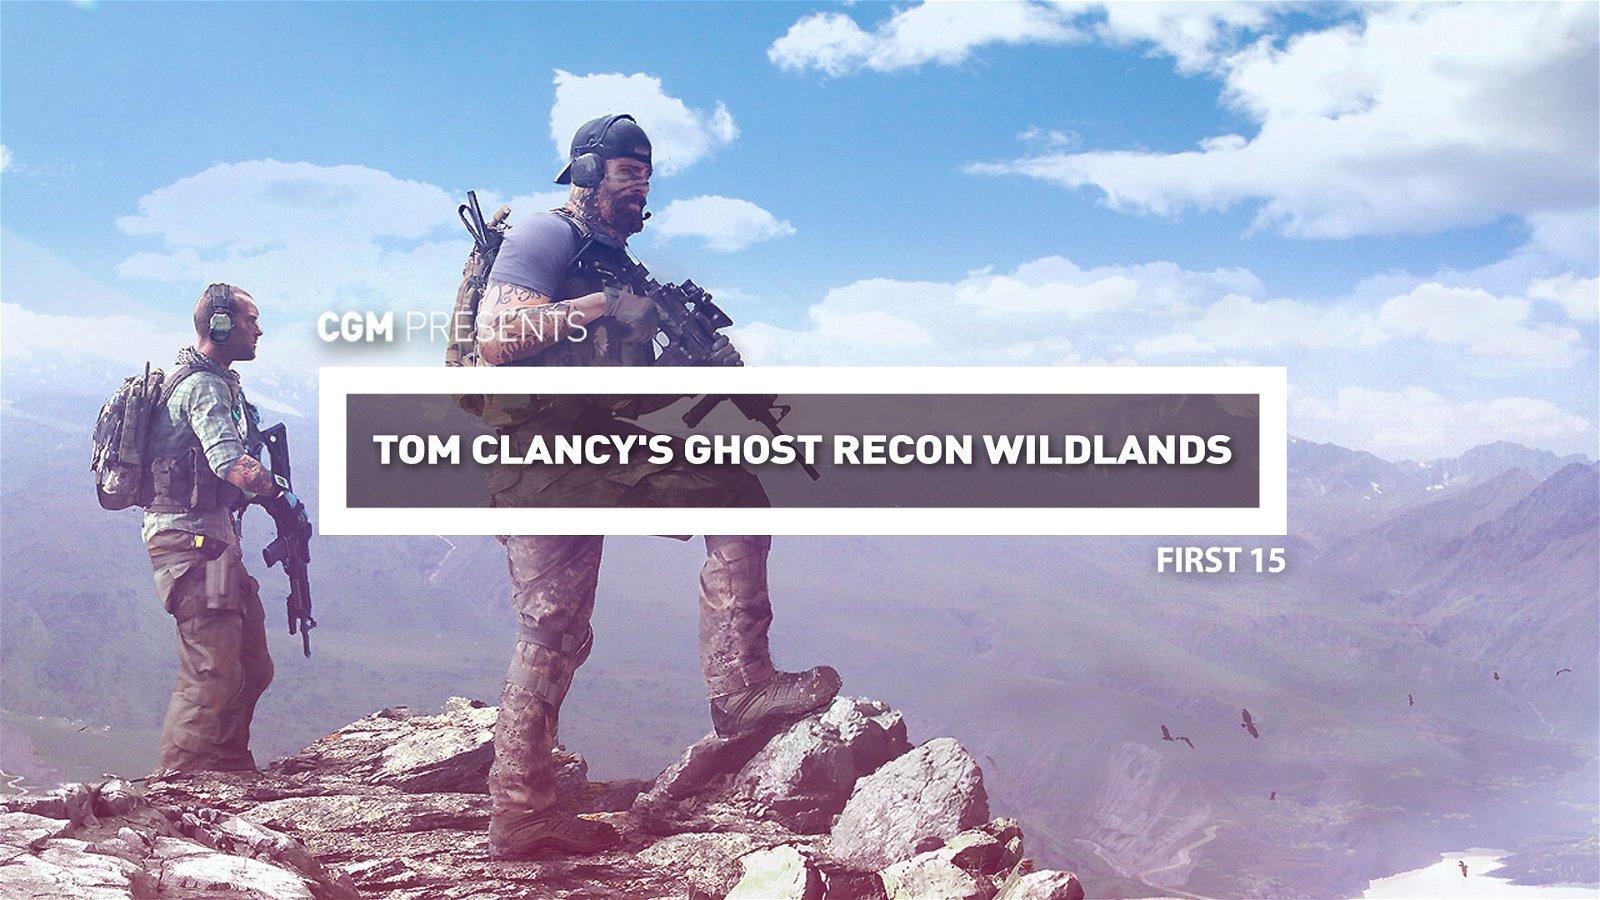 First 15: Tom Clancy's Ghost Recon Wildlands 2